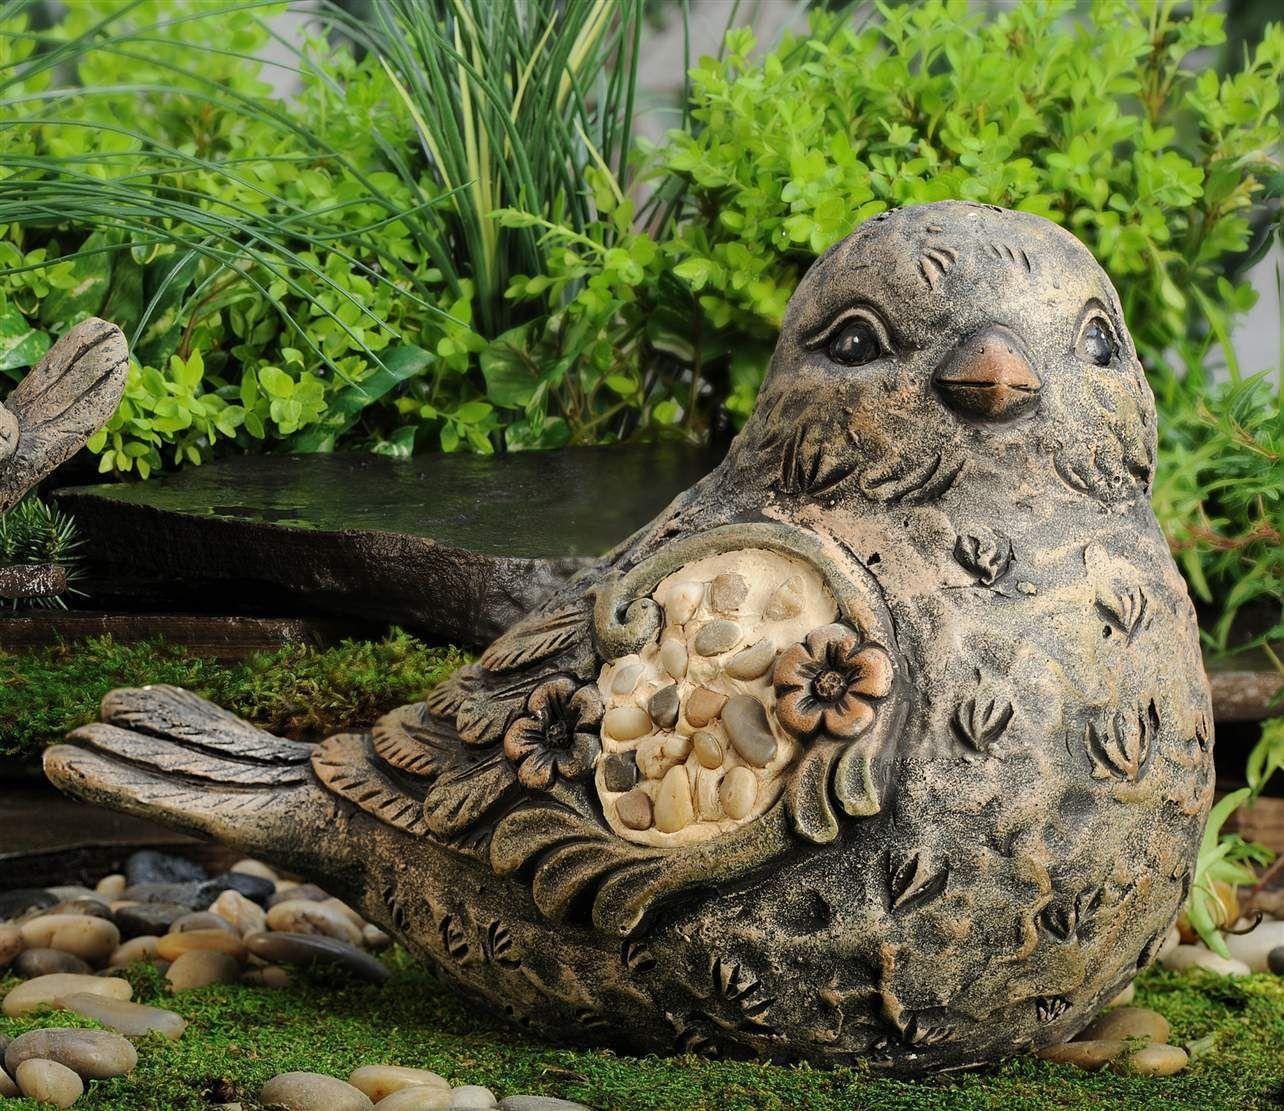 14 in.Magnesia BIRD figurine with River Stone garden pond decor ...